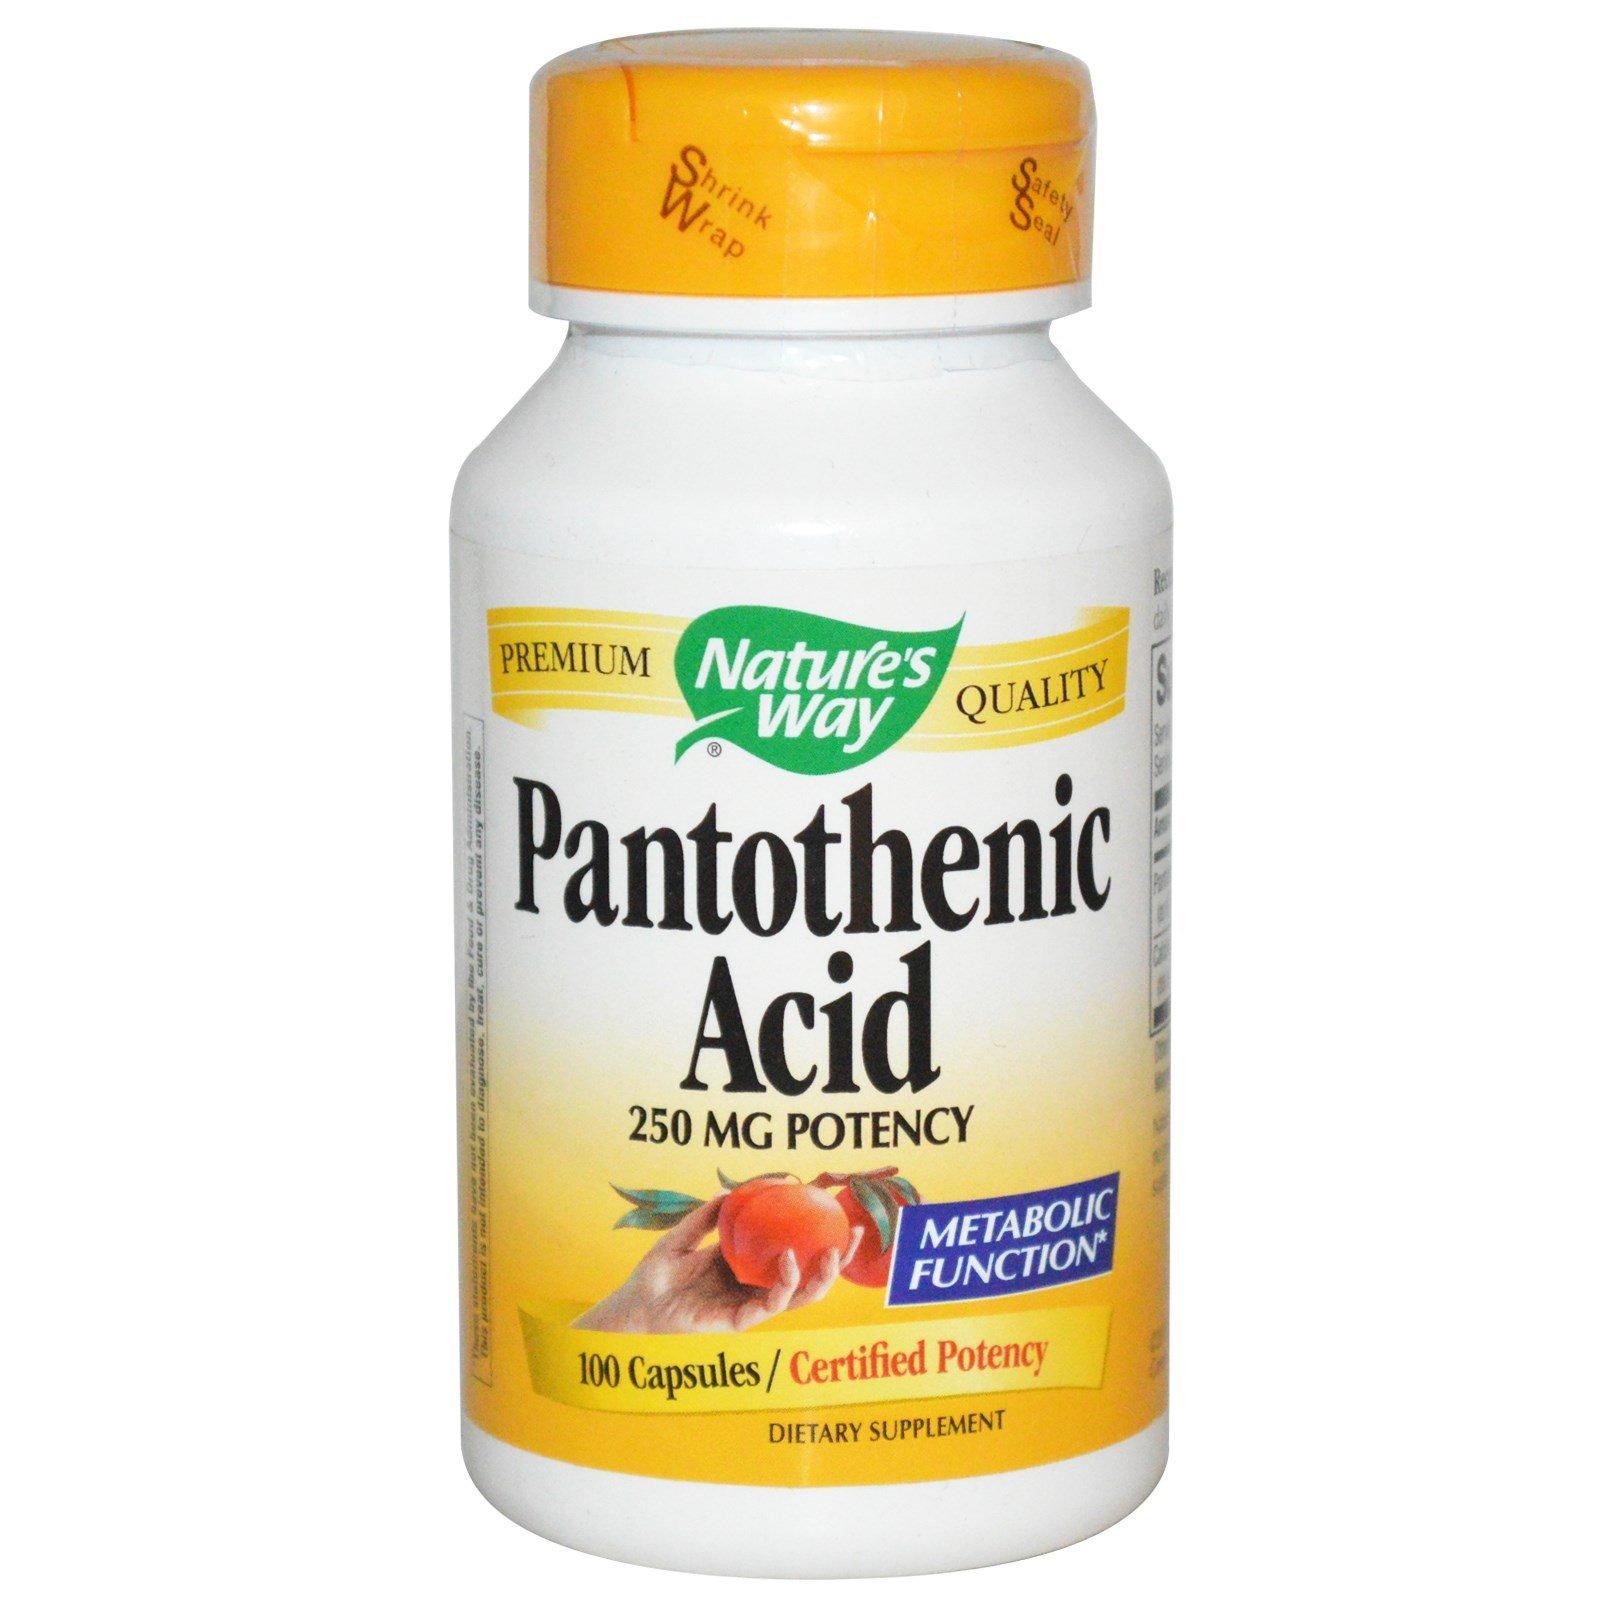 Nature's Way Pantothenic Acid, 100 Capsules (Pack of 2)